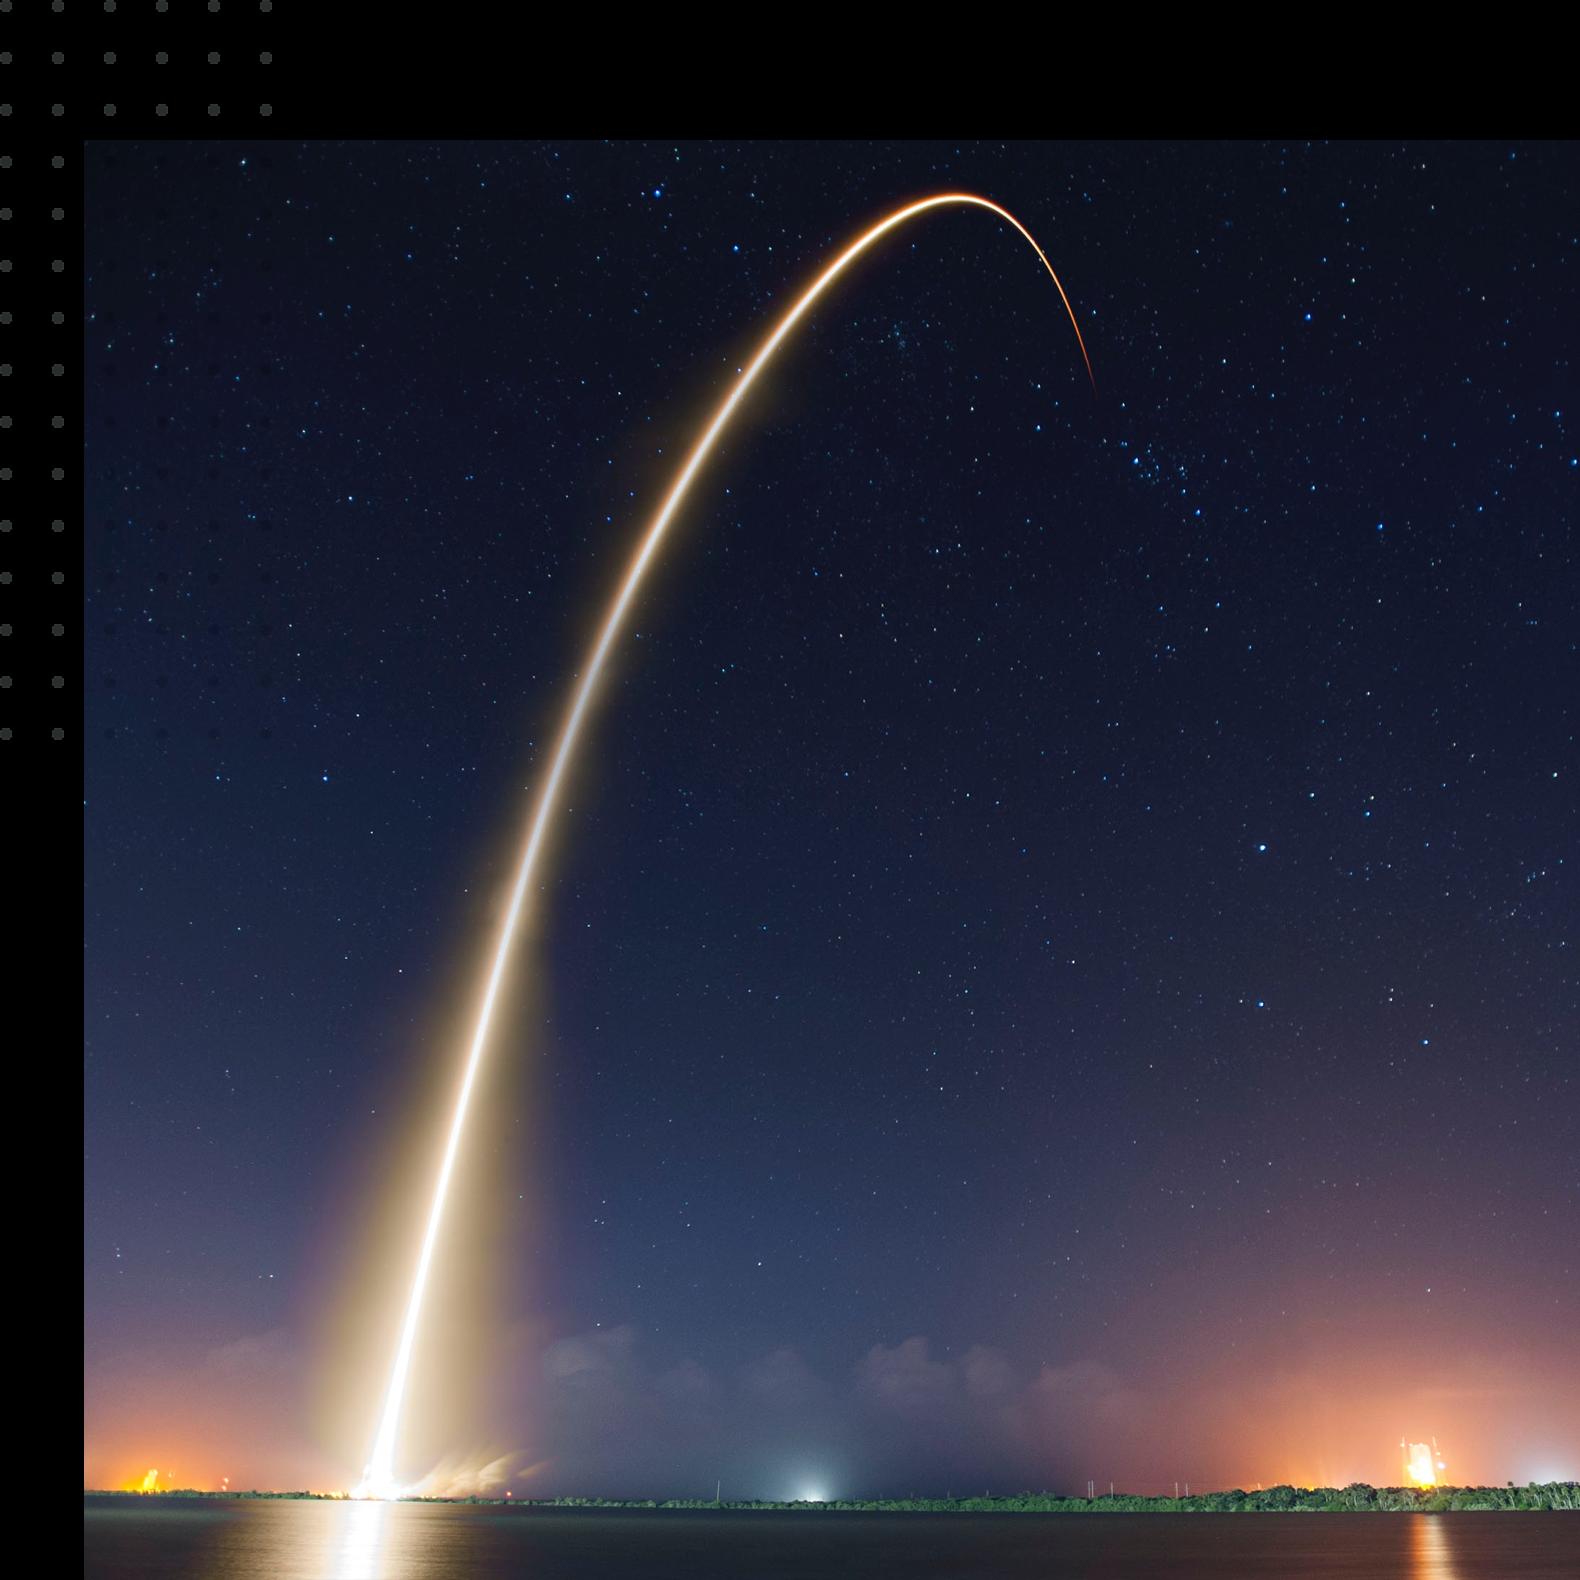 rocket@2x.png